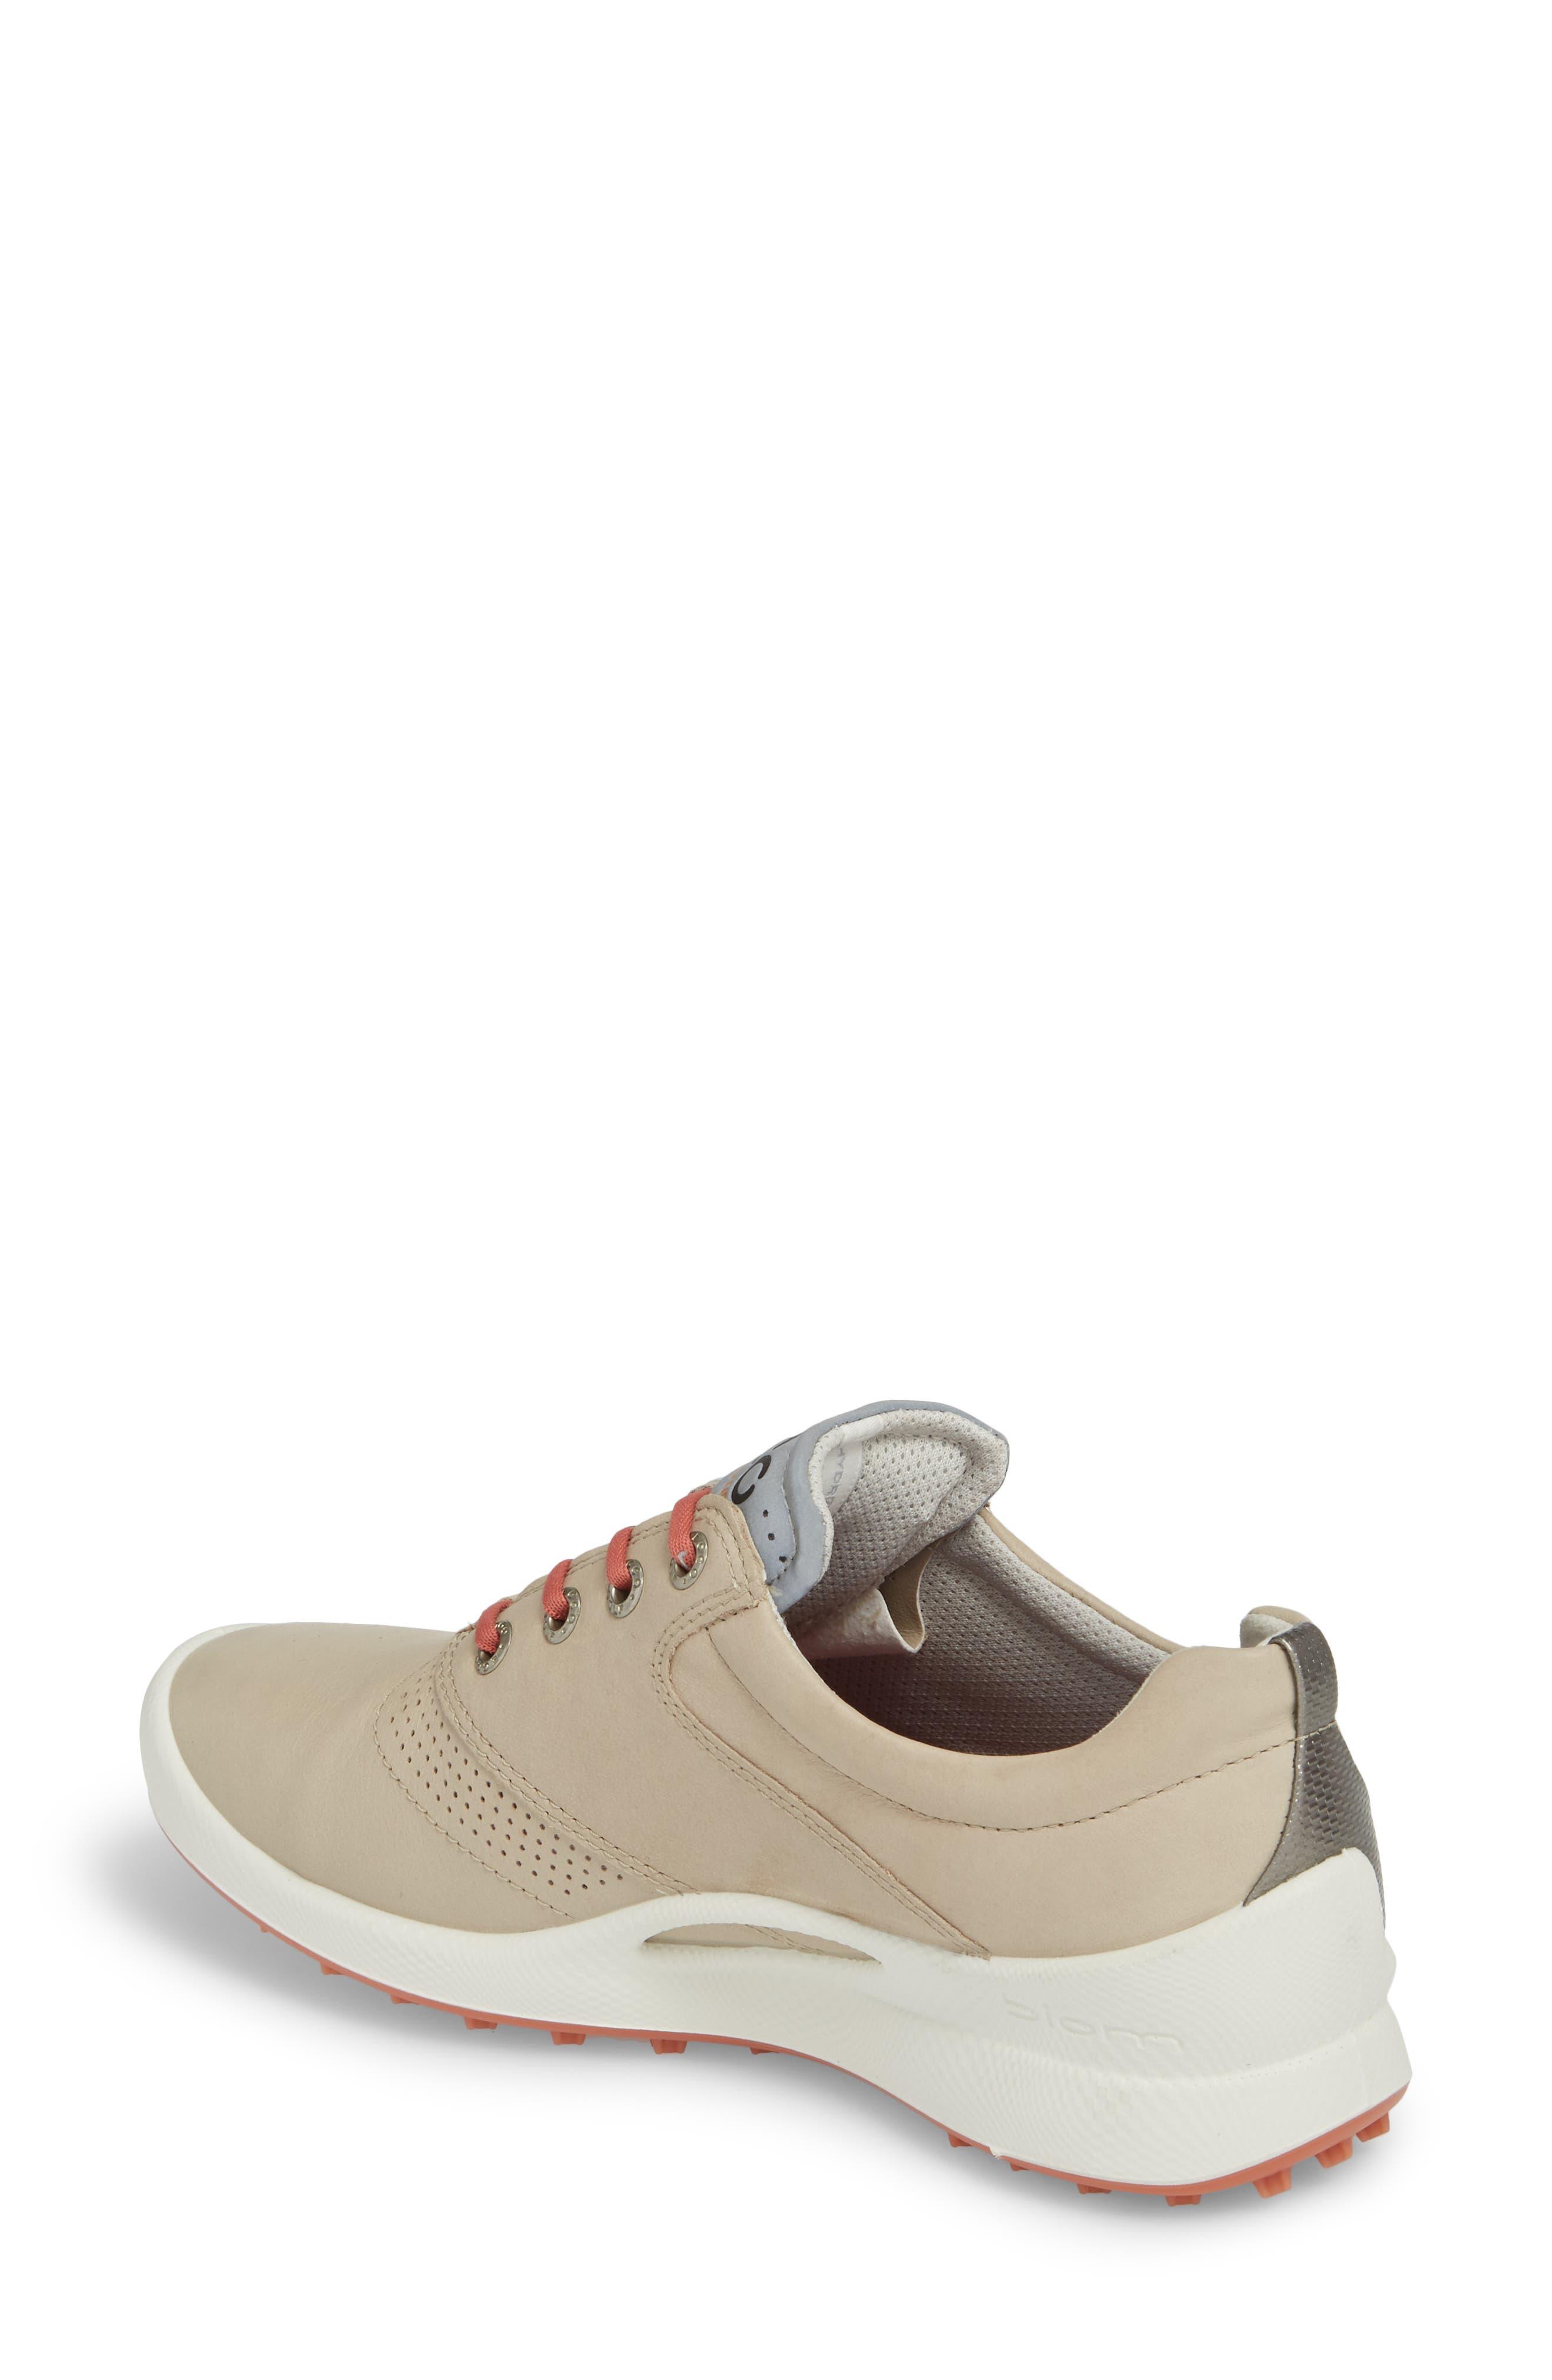 Biom Hybrid Golf Shoe,                             Alternate thumbnail 4, color,